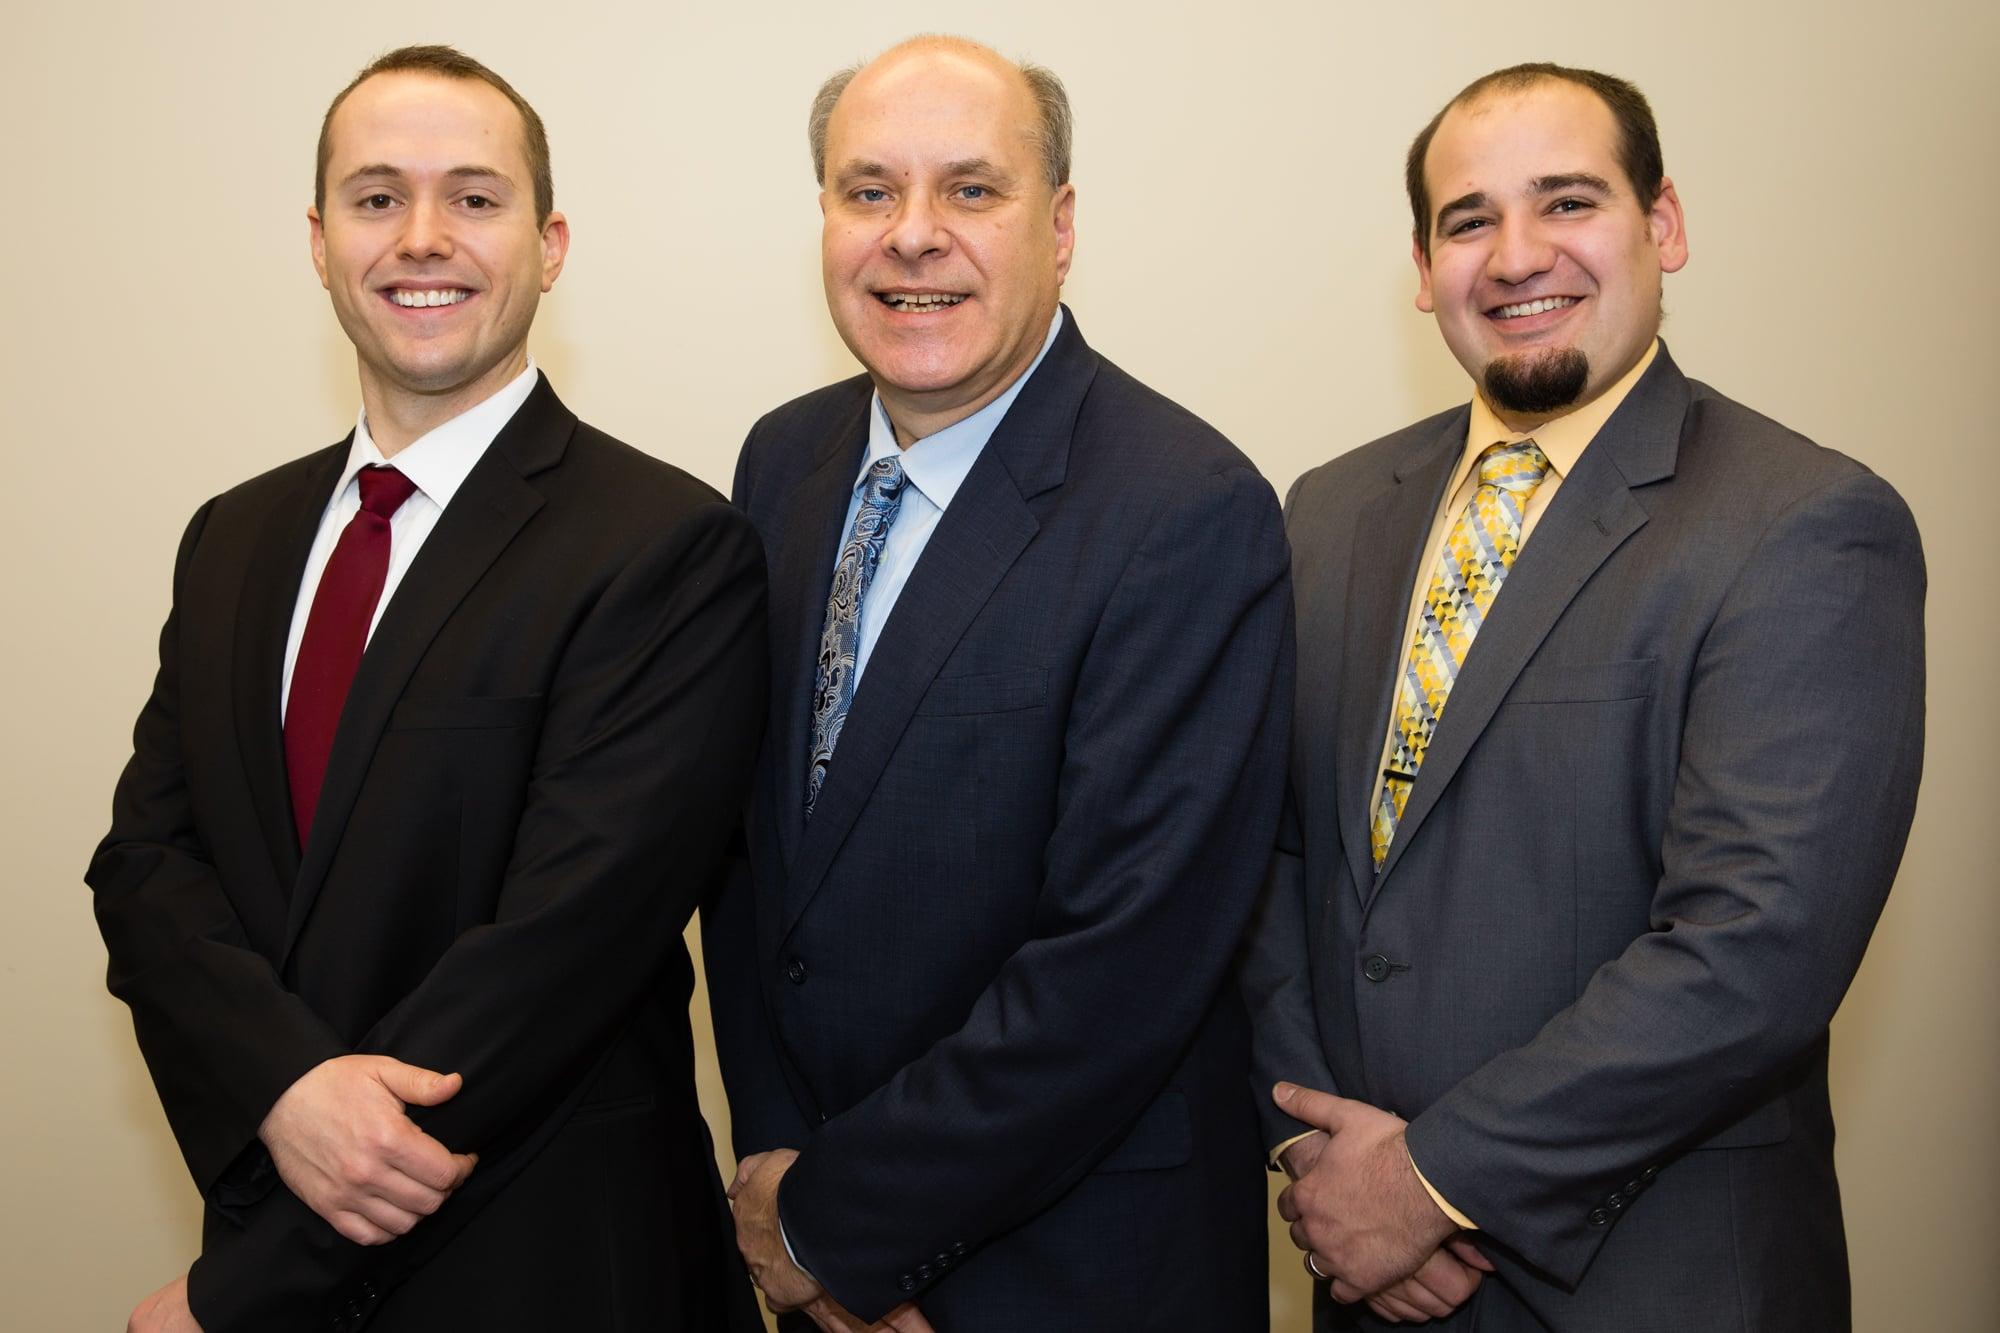 Michael Warne, Mark Winiecki and John Murphy